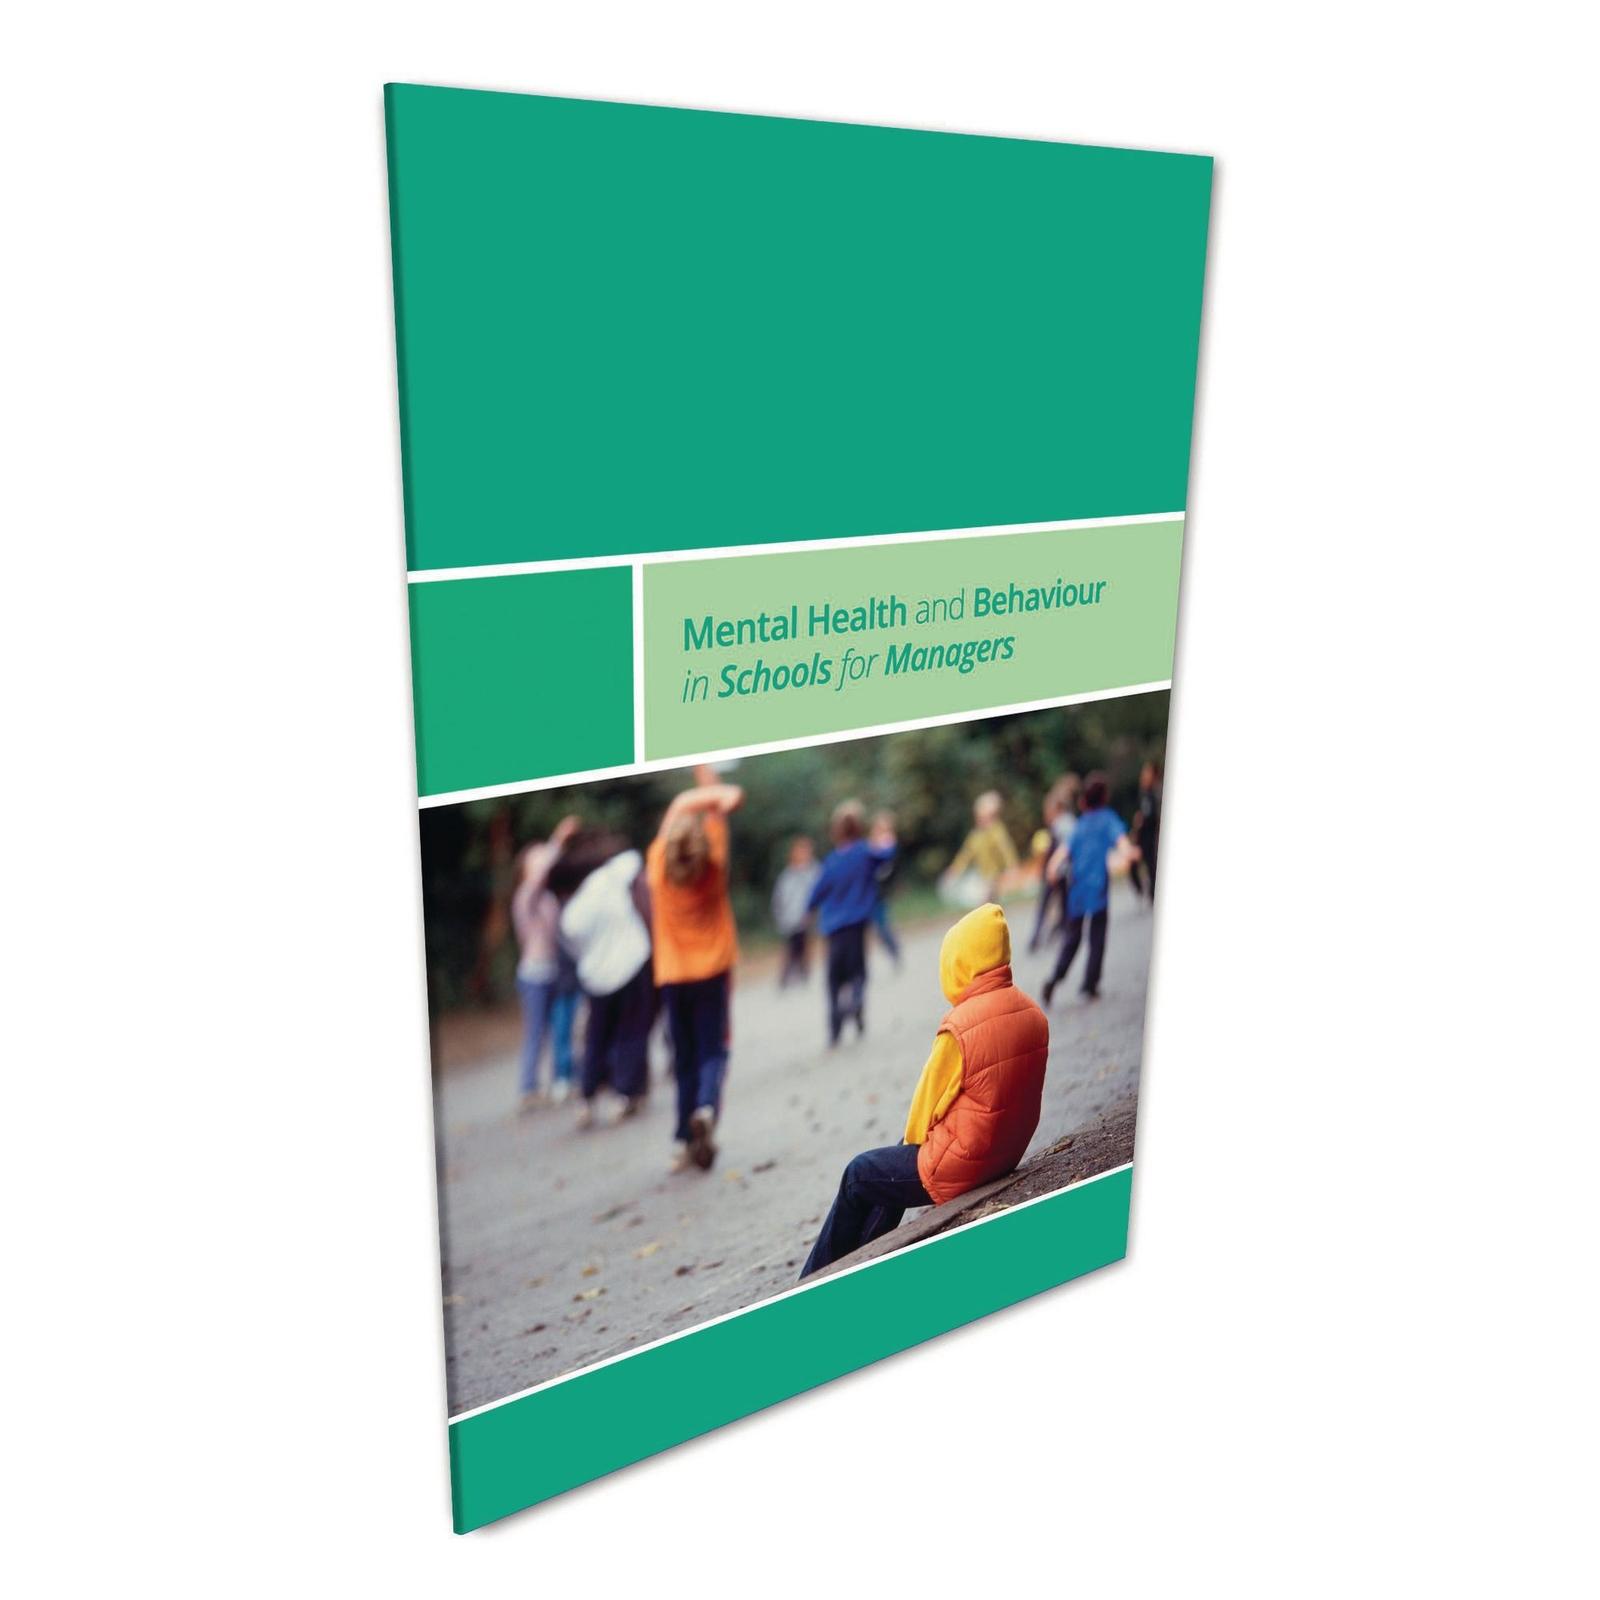 Mental Health and Behaviour in Schools